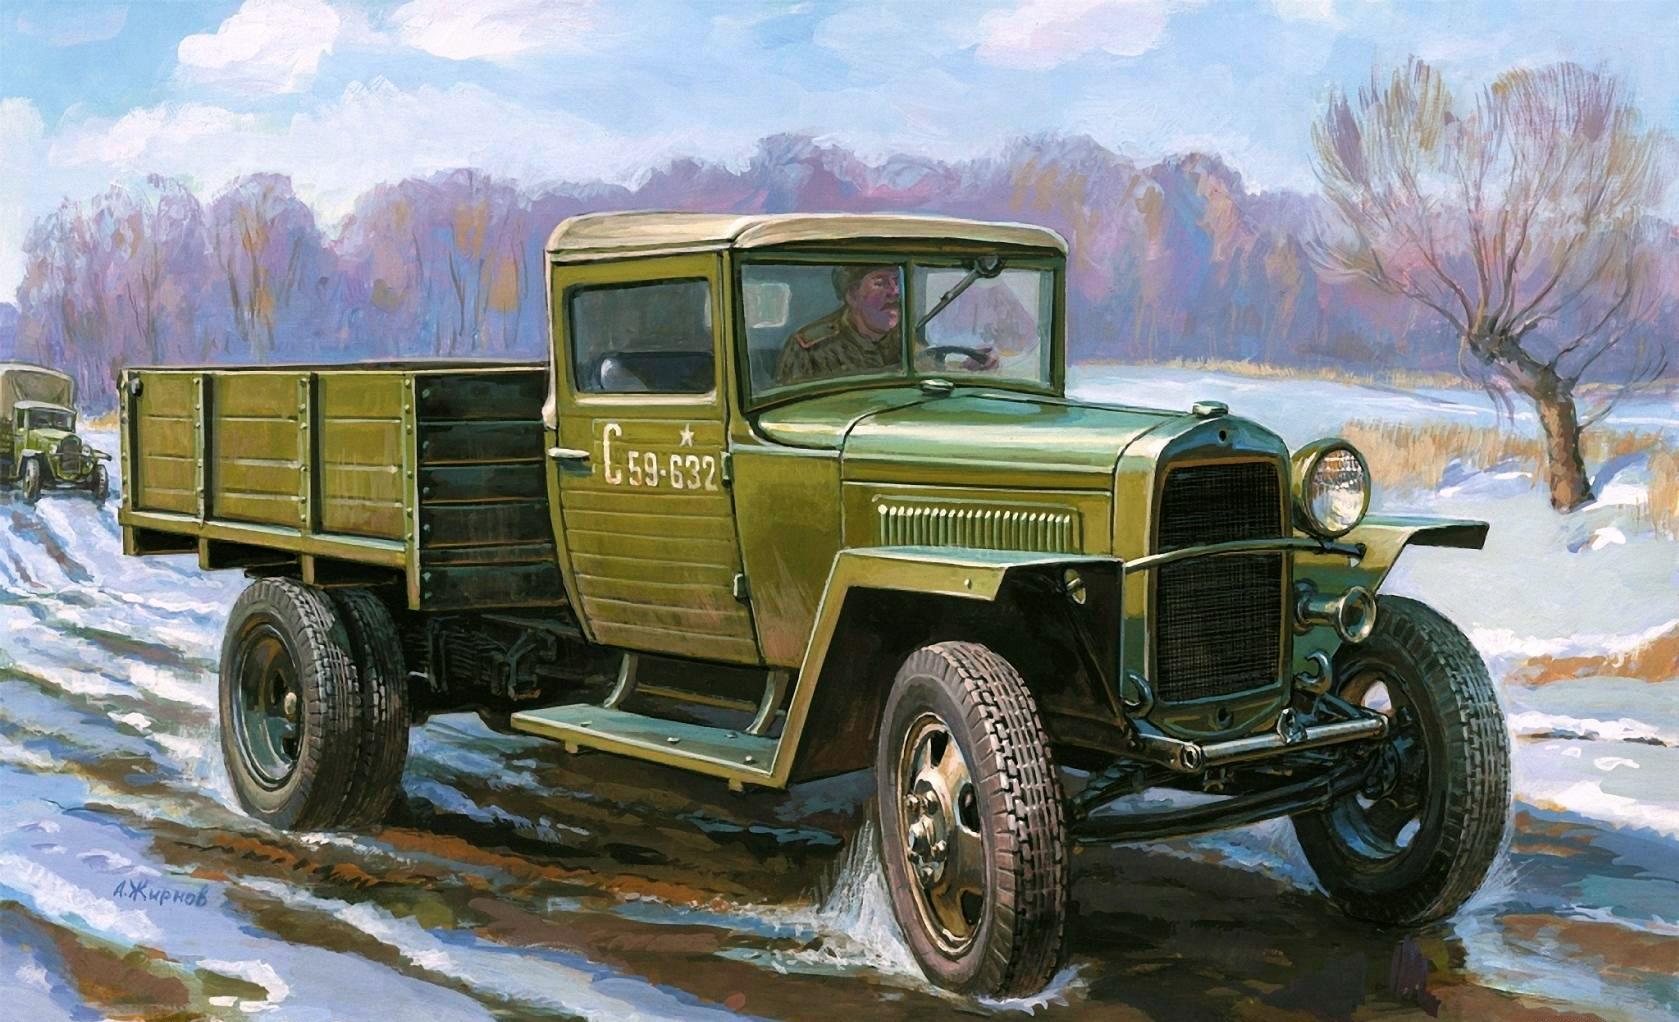 Wallpaper GAZ MM Painting Art Army 1679x1022